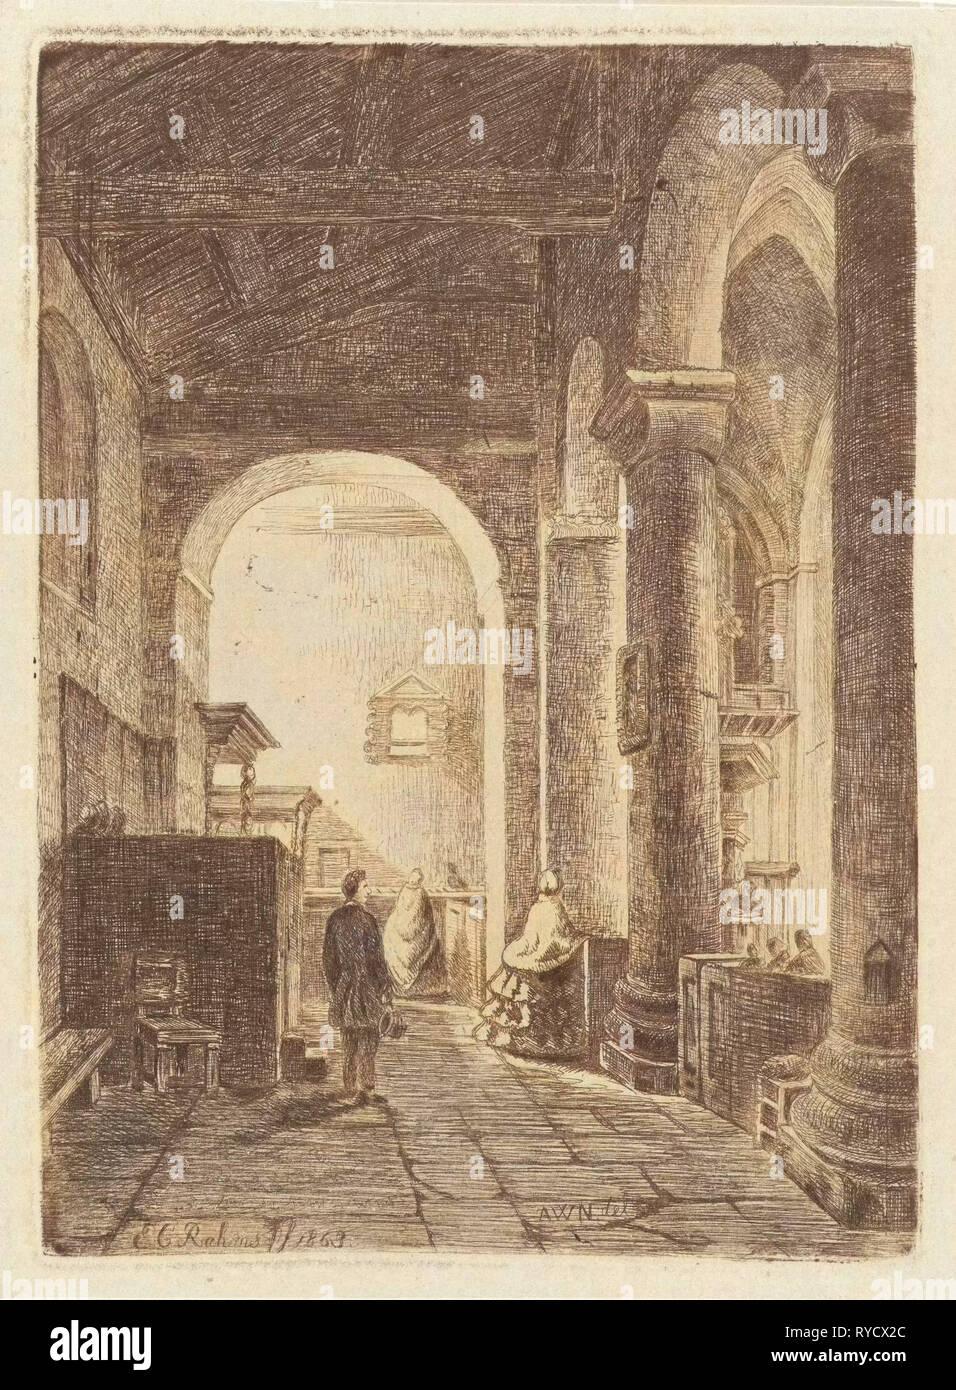 Interior of a church, Eberhard Cornelis Rahms, 1863 - Stock Image